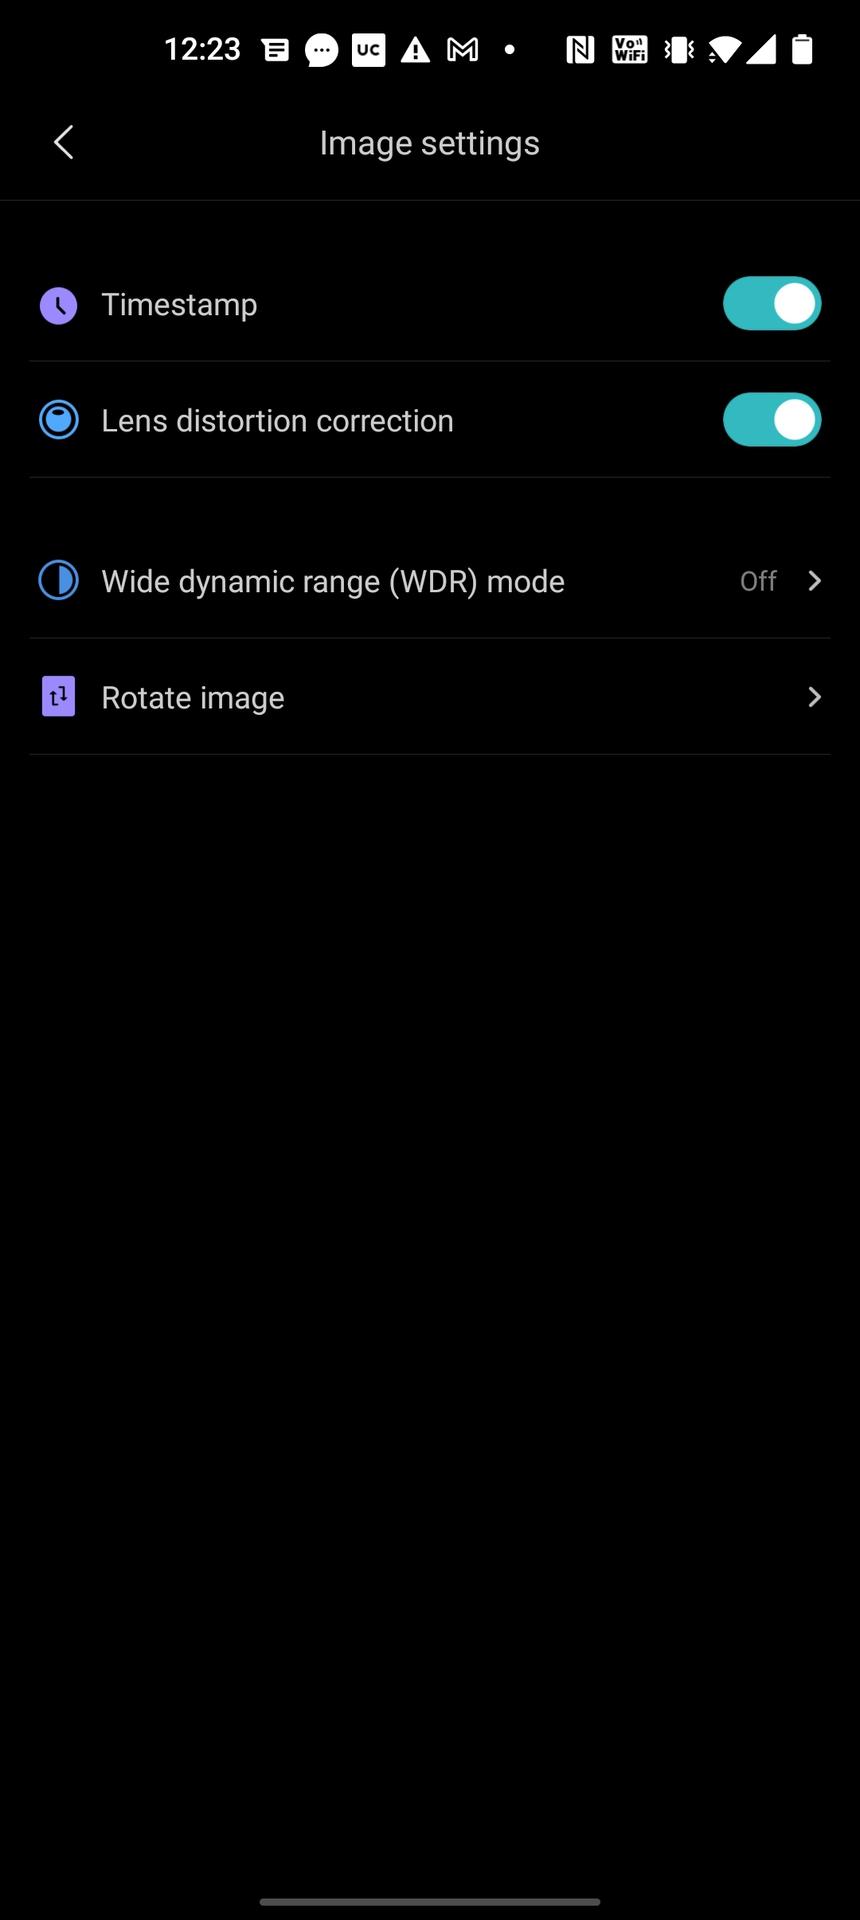 Mi 360 security camera app image settings